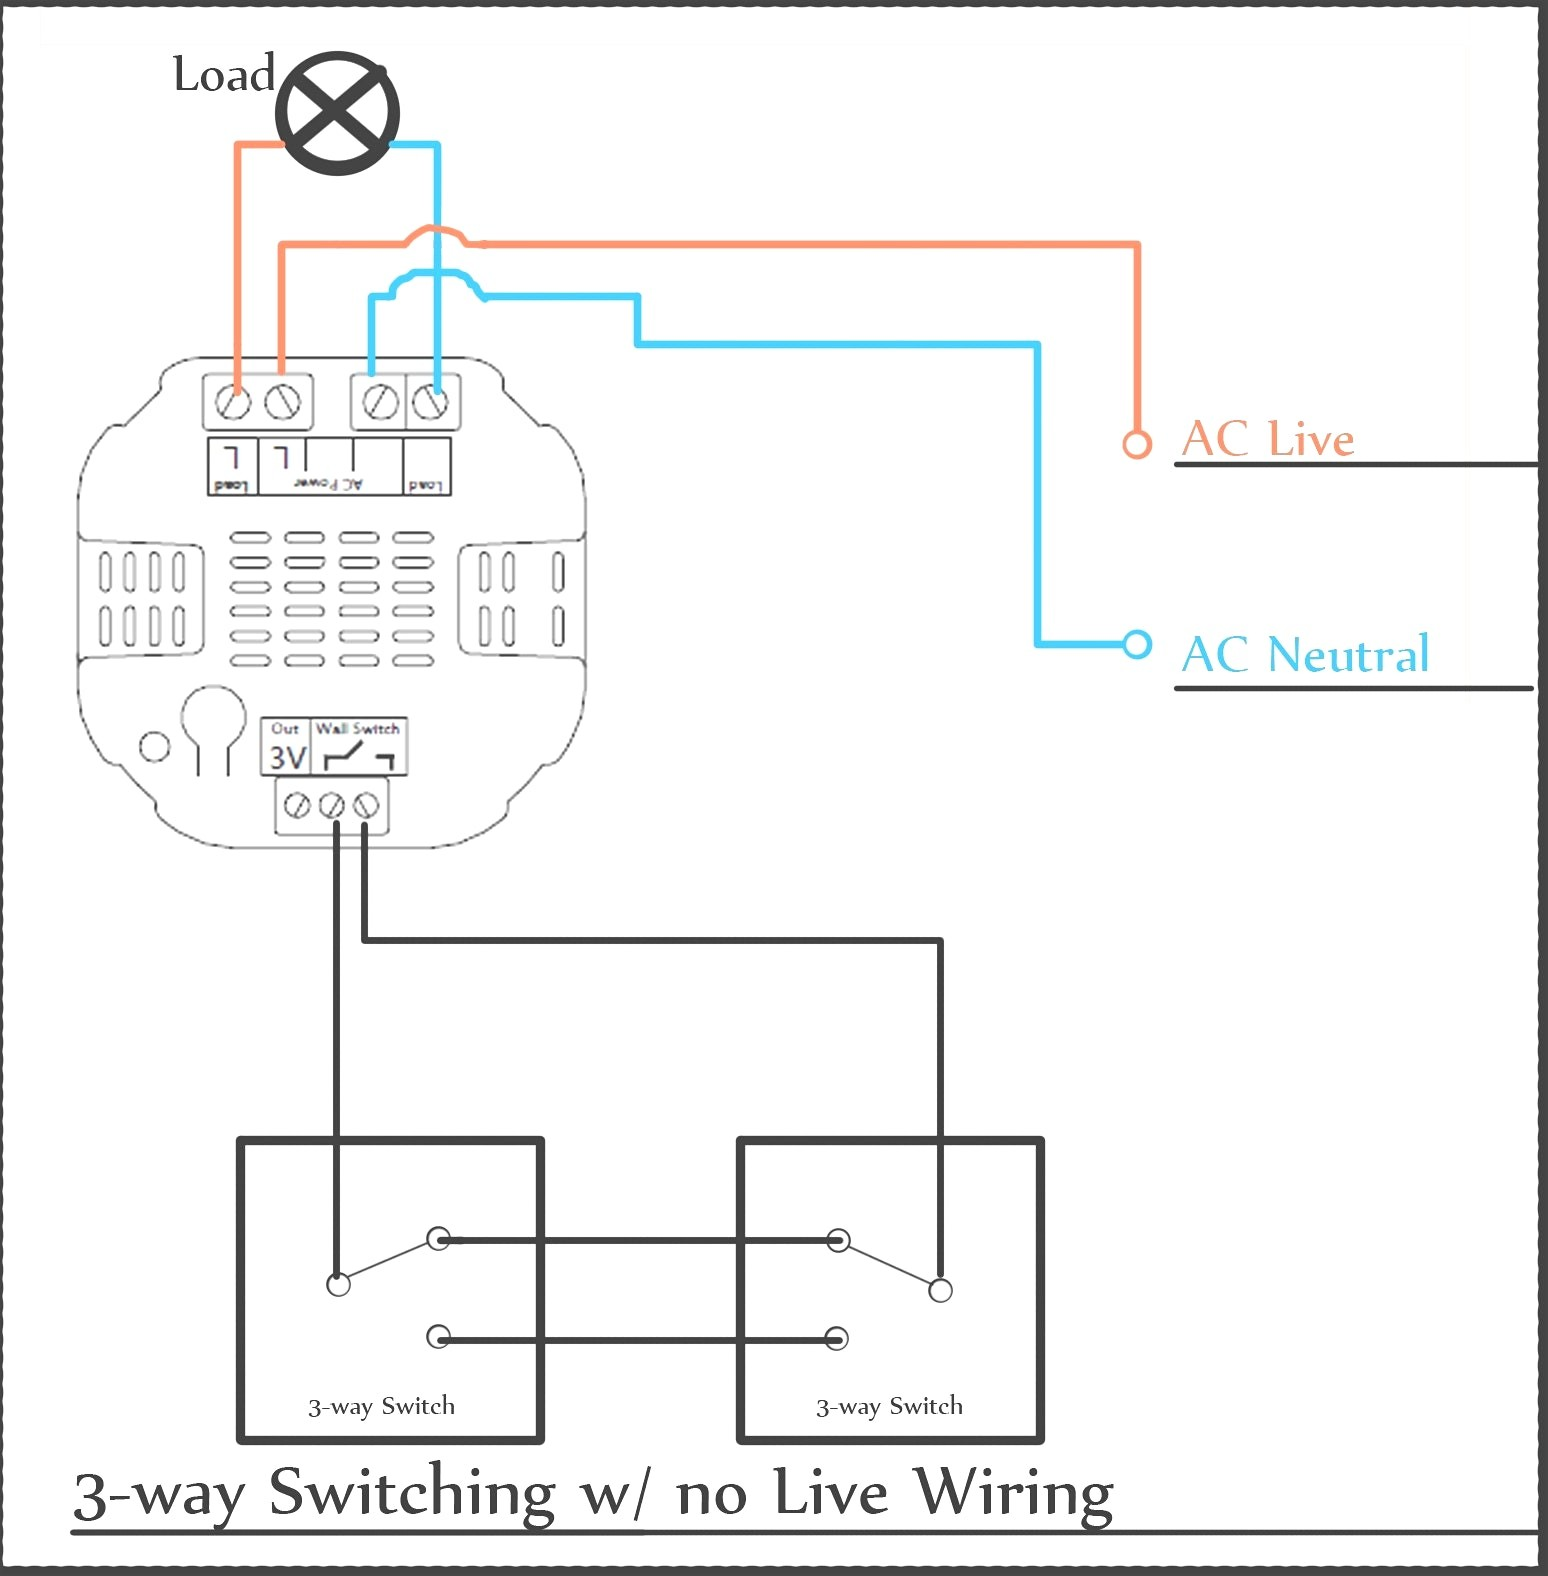 Leviton 3 Way Switch Wiring Diagram Leviton Dimmers Wiring Diagram B2network Of Leviton 3 Way Switch Wiring Diagram Luxury 3 Way Wiring Diagram Diagram